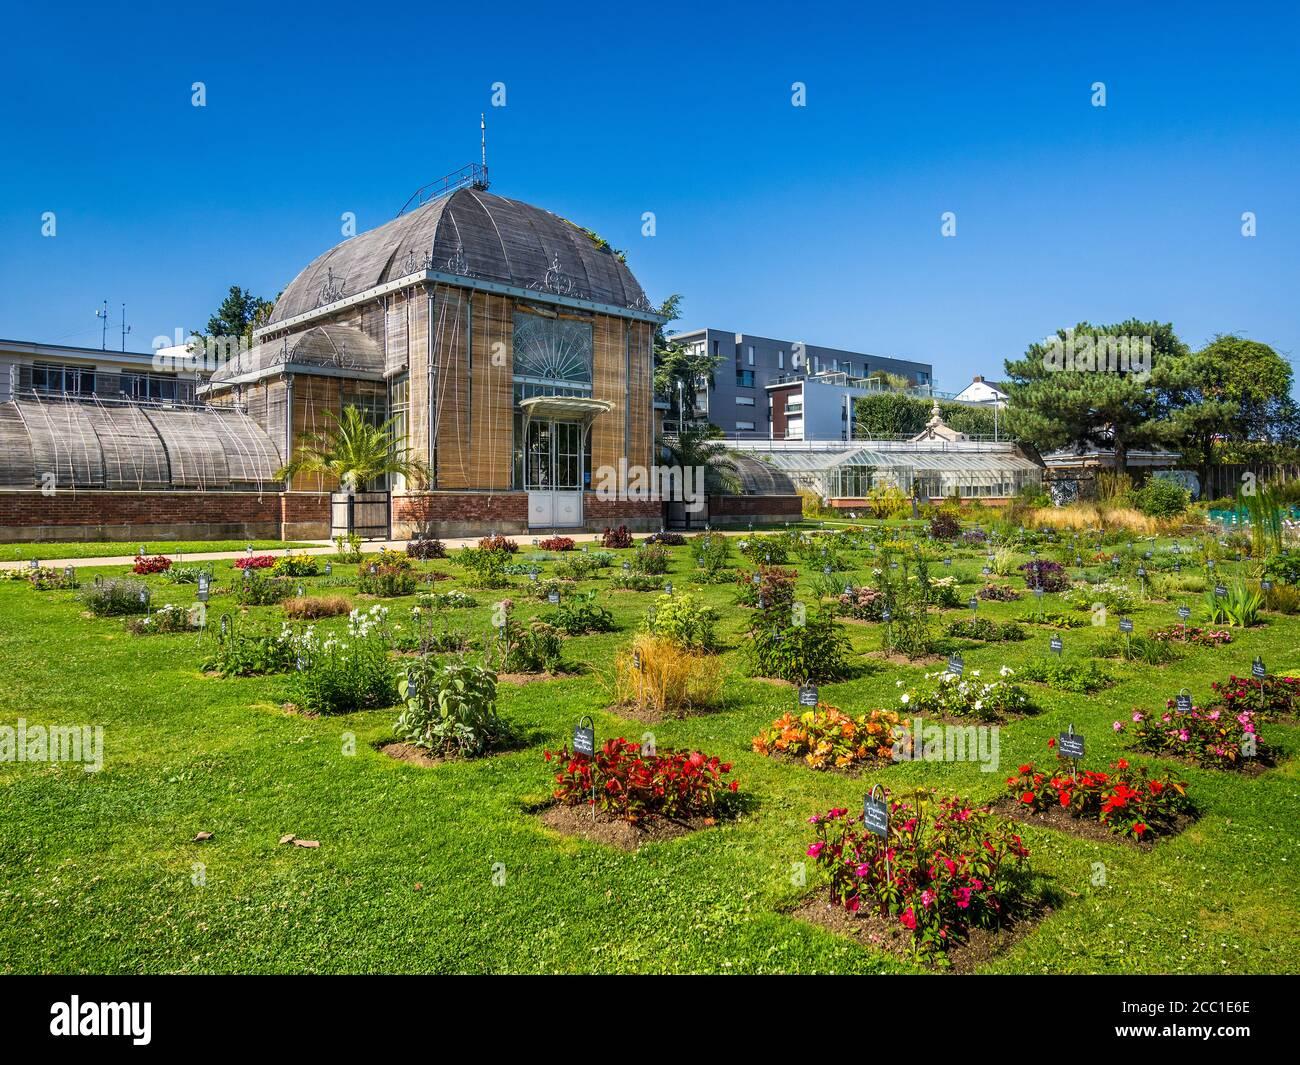 Wooden blinds covering the windows of the Palmarium in the Jardin des Plantes - Nantes, Loire-Atlantique, France. Stock Photo